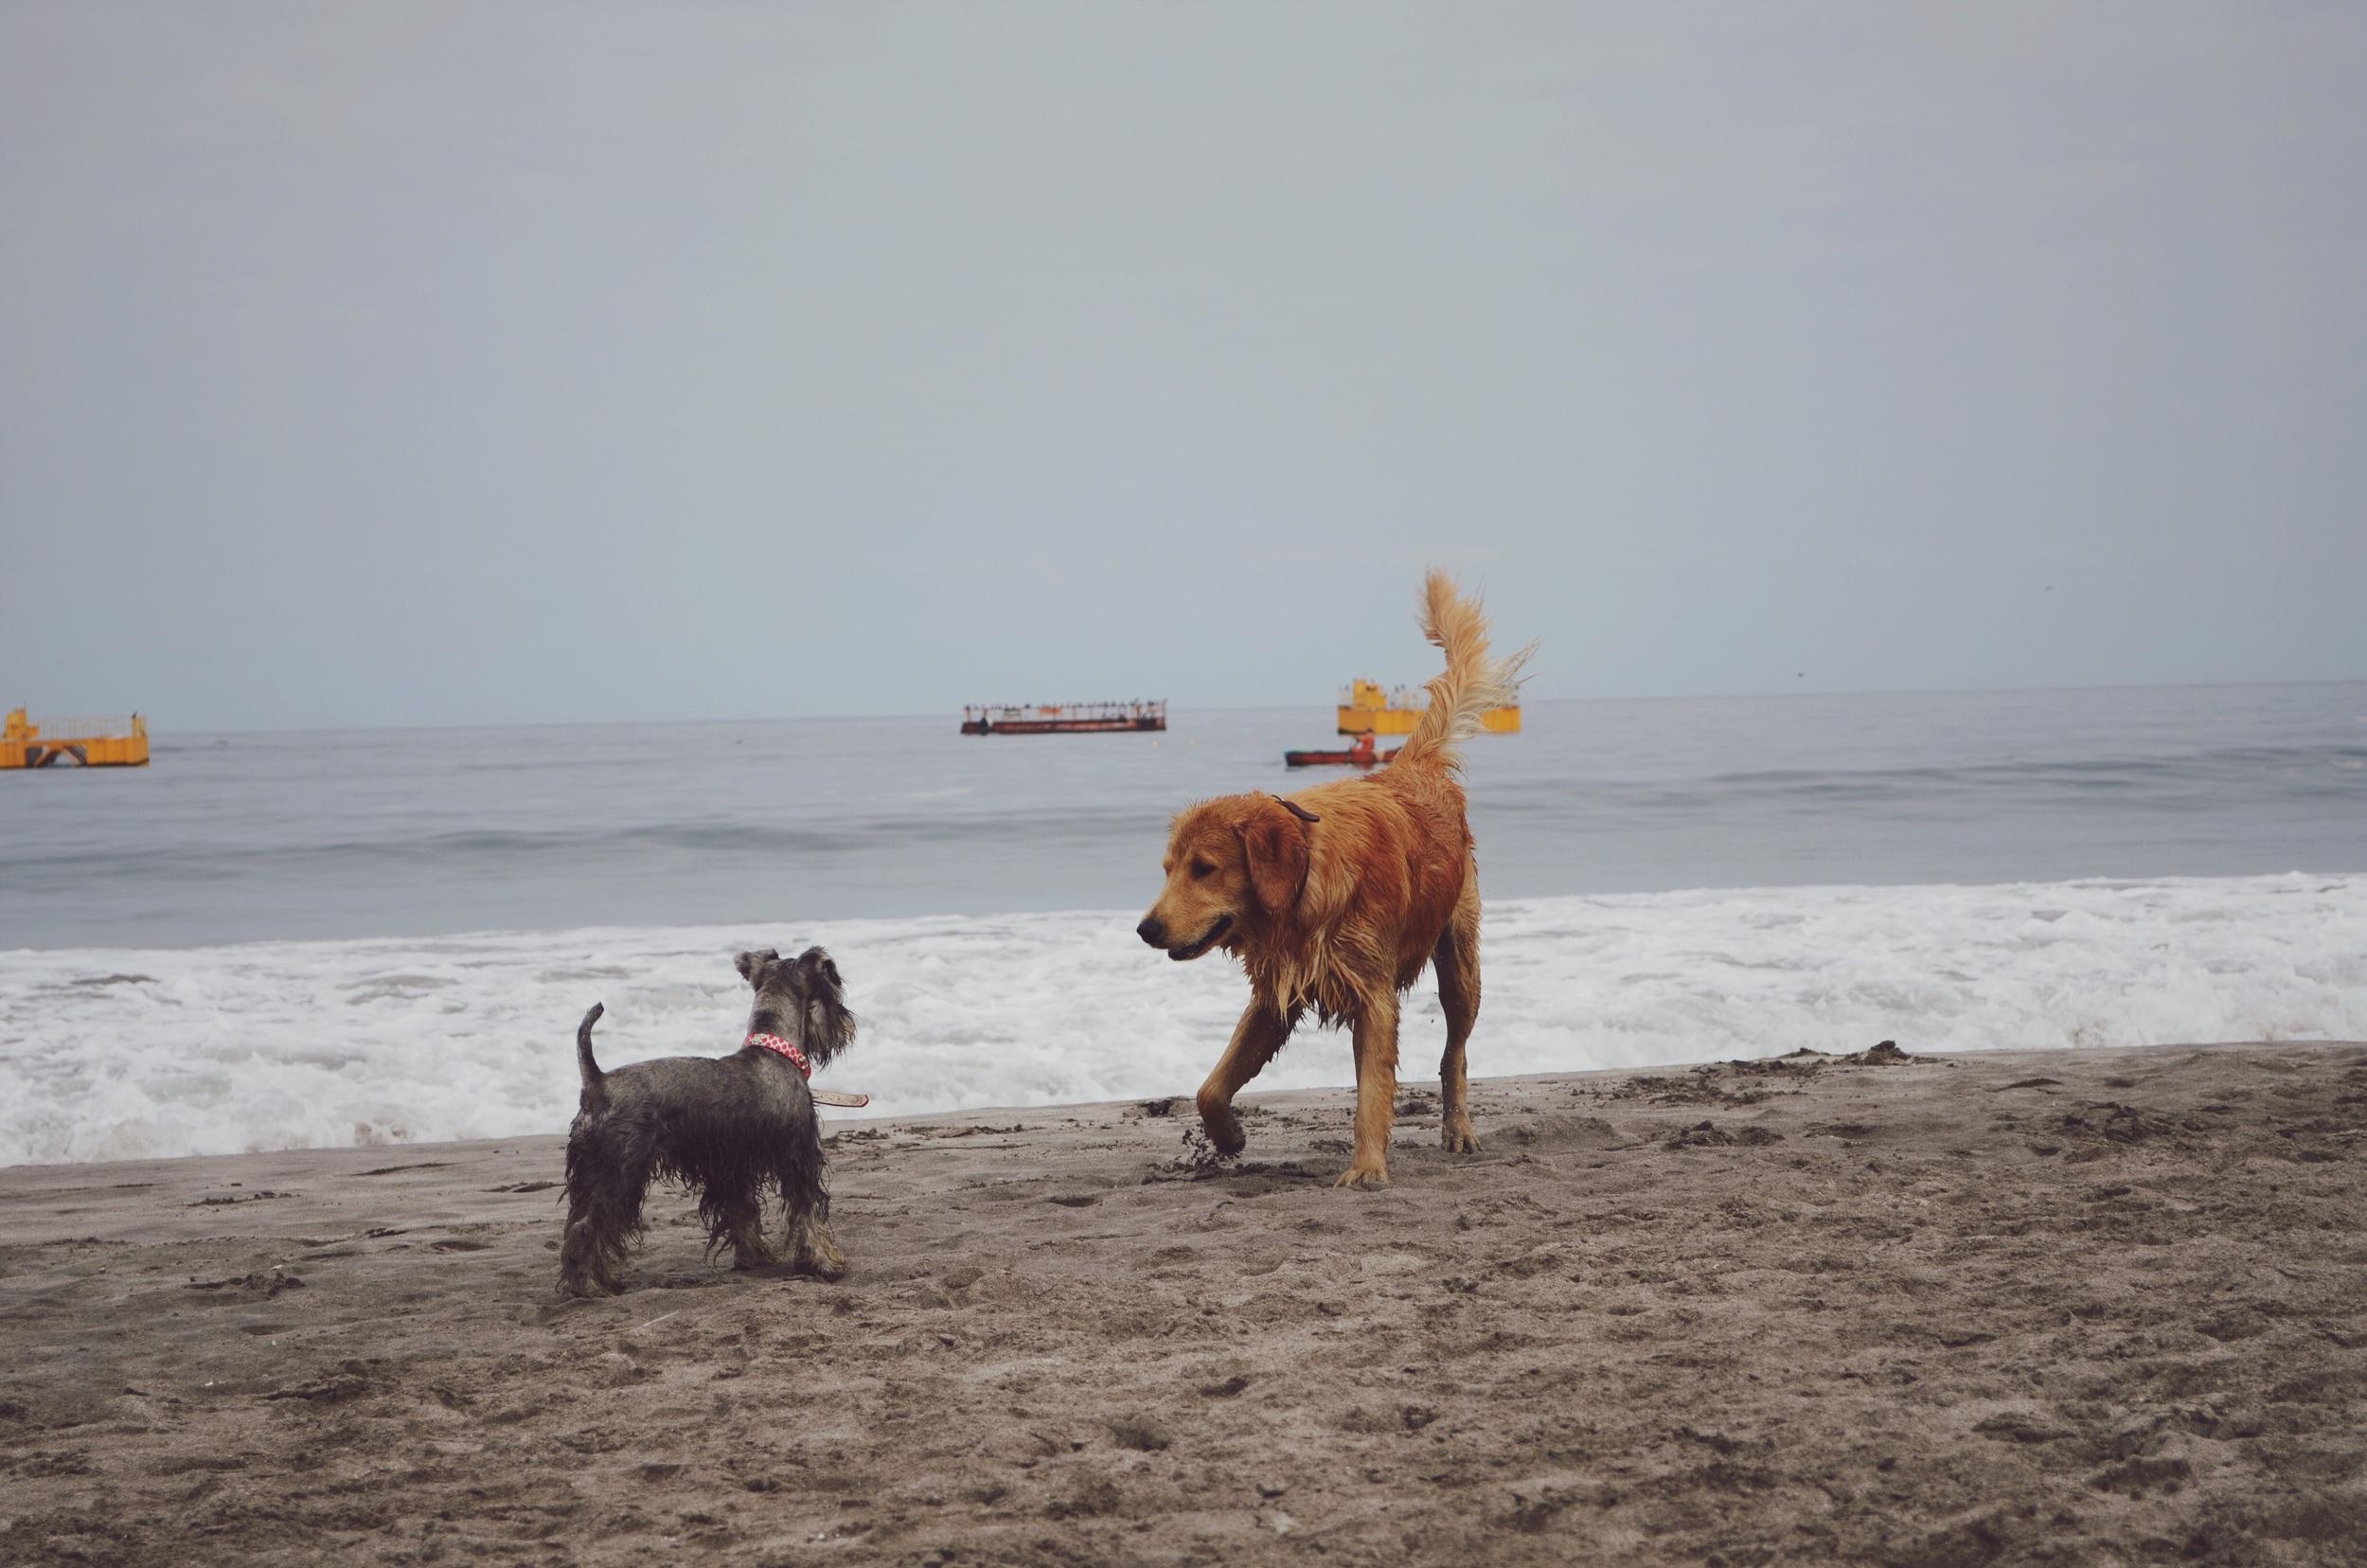 Furry friends meeting on Cavancha beach // 5 april 2015